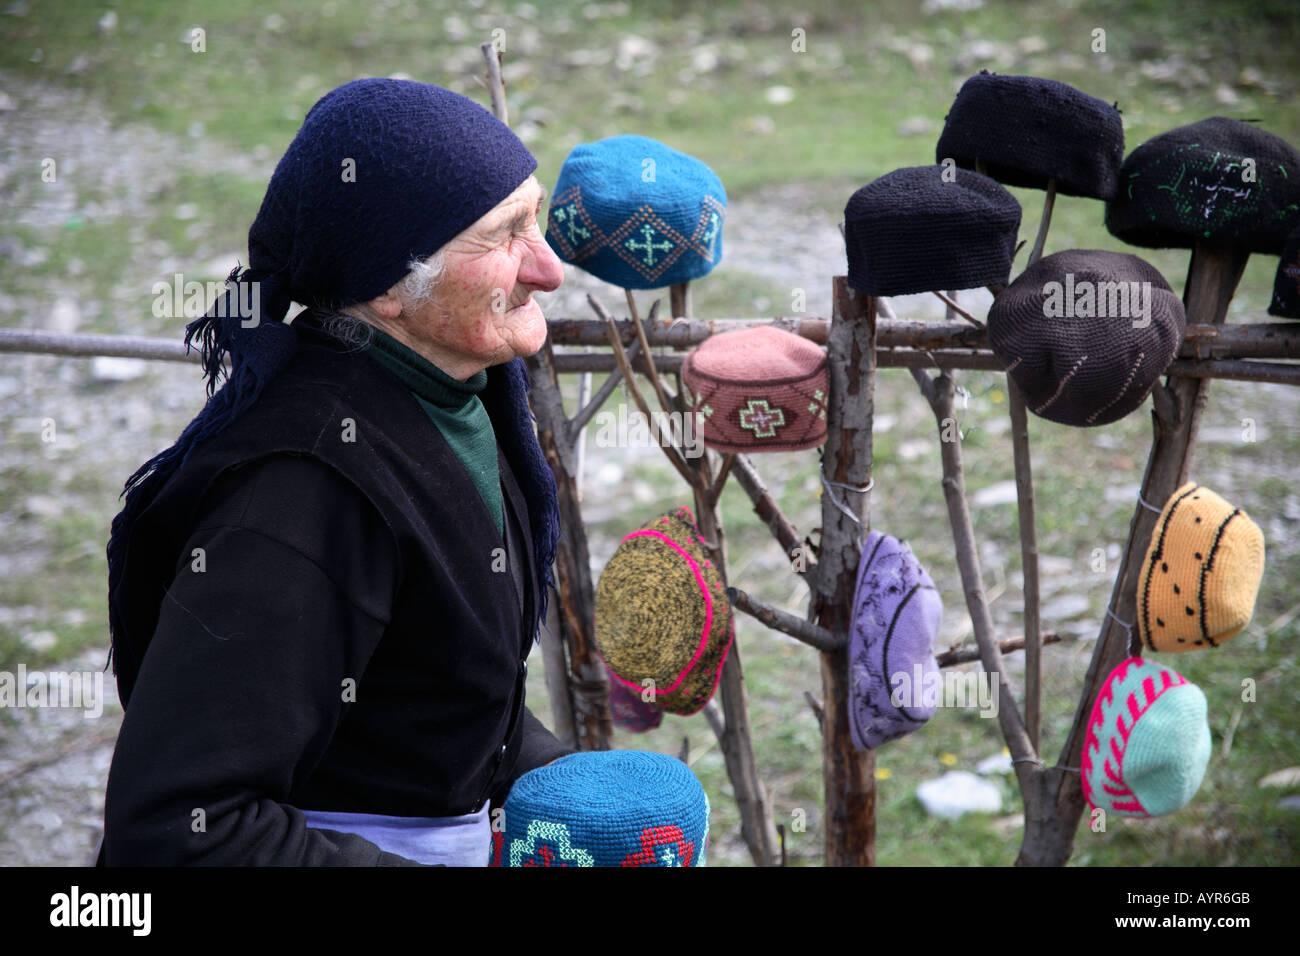 Roadside hat seller. Jvari Pass, Georgian Military Highway, Georgia, Southwest Asia - Stock Image